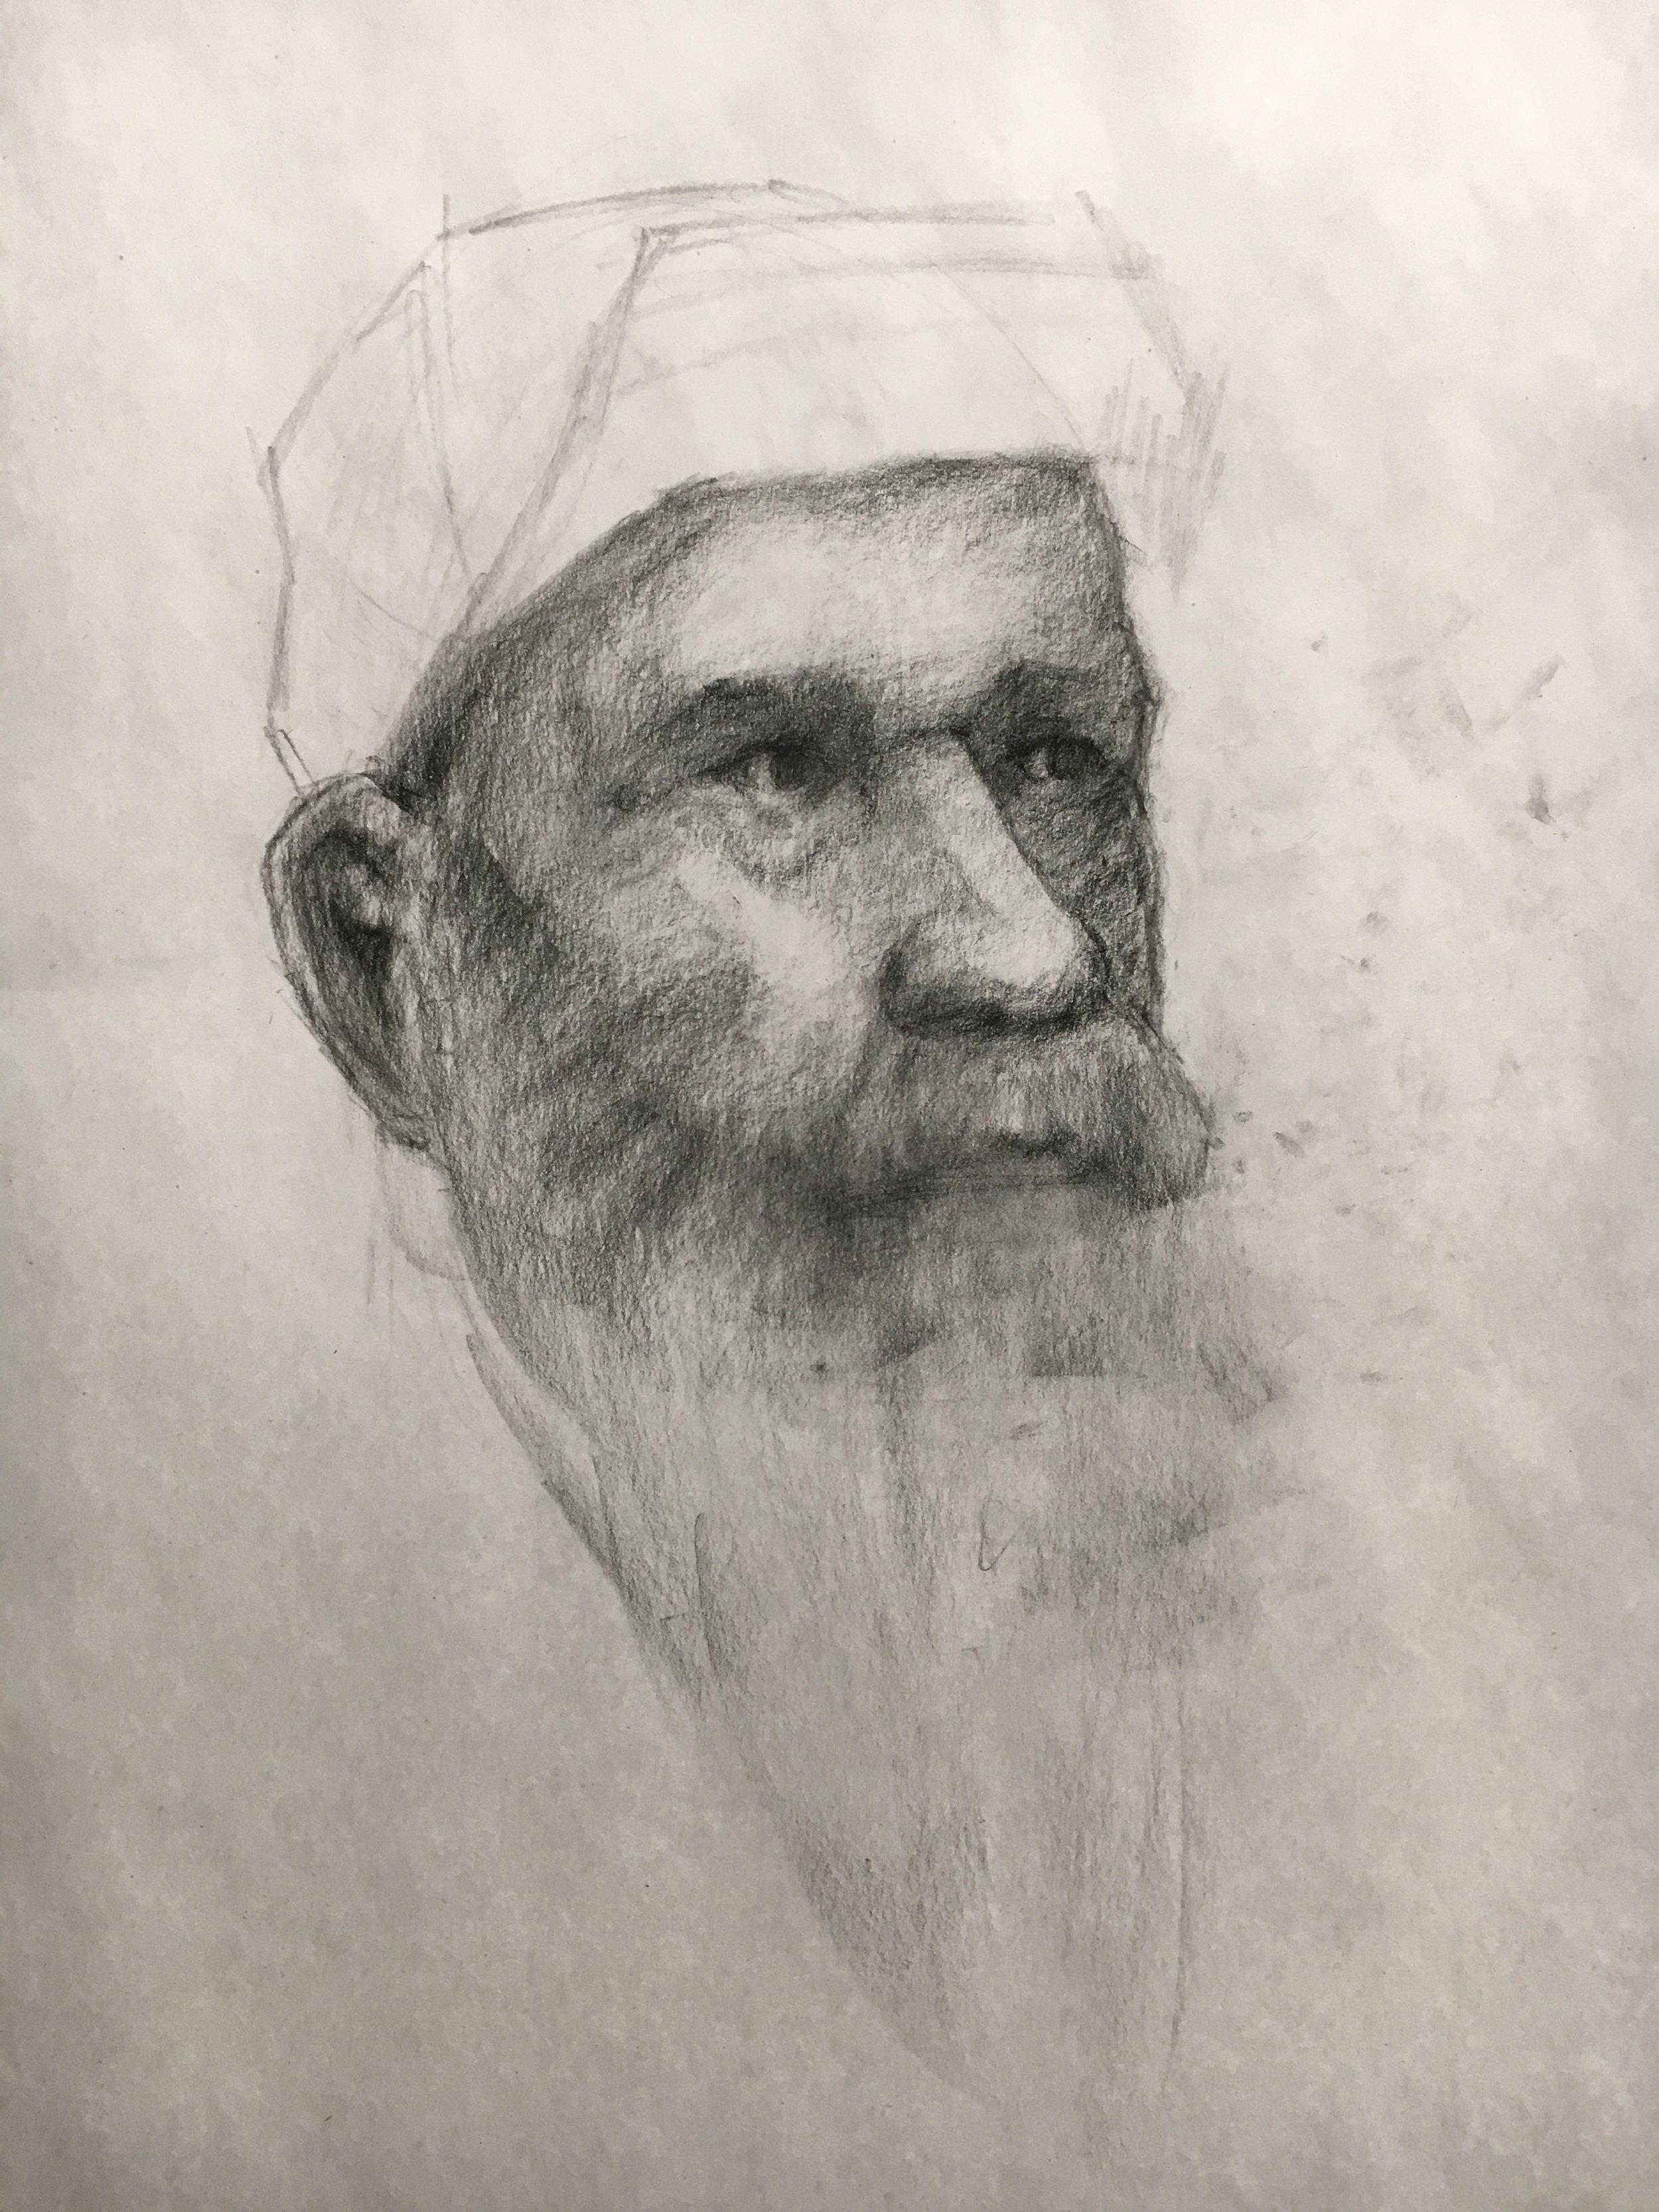 PortraitMan01a.JPG